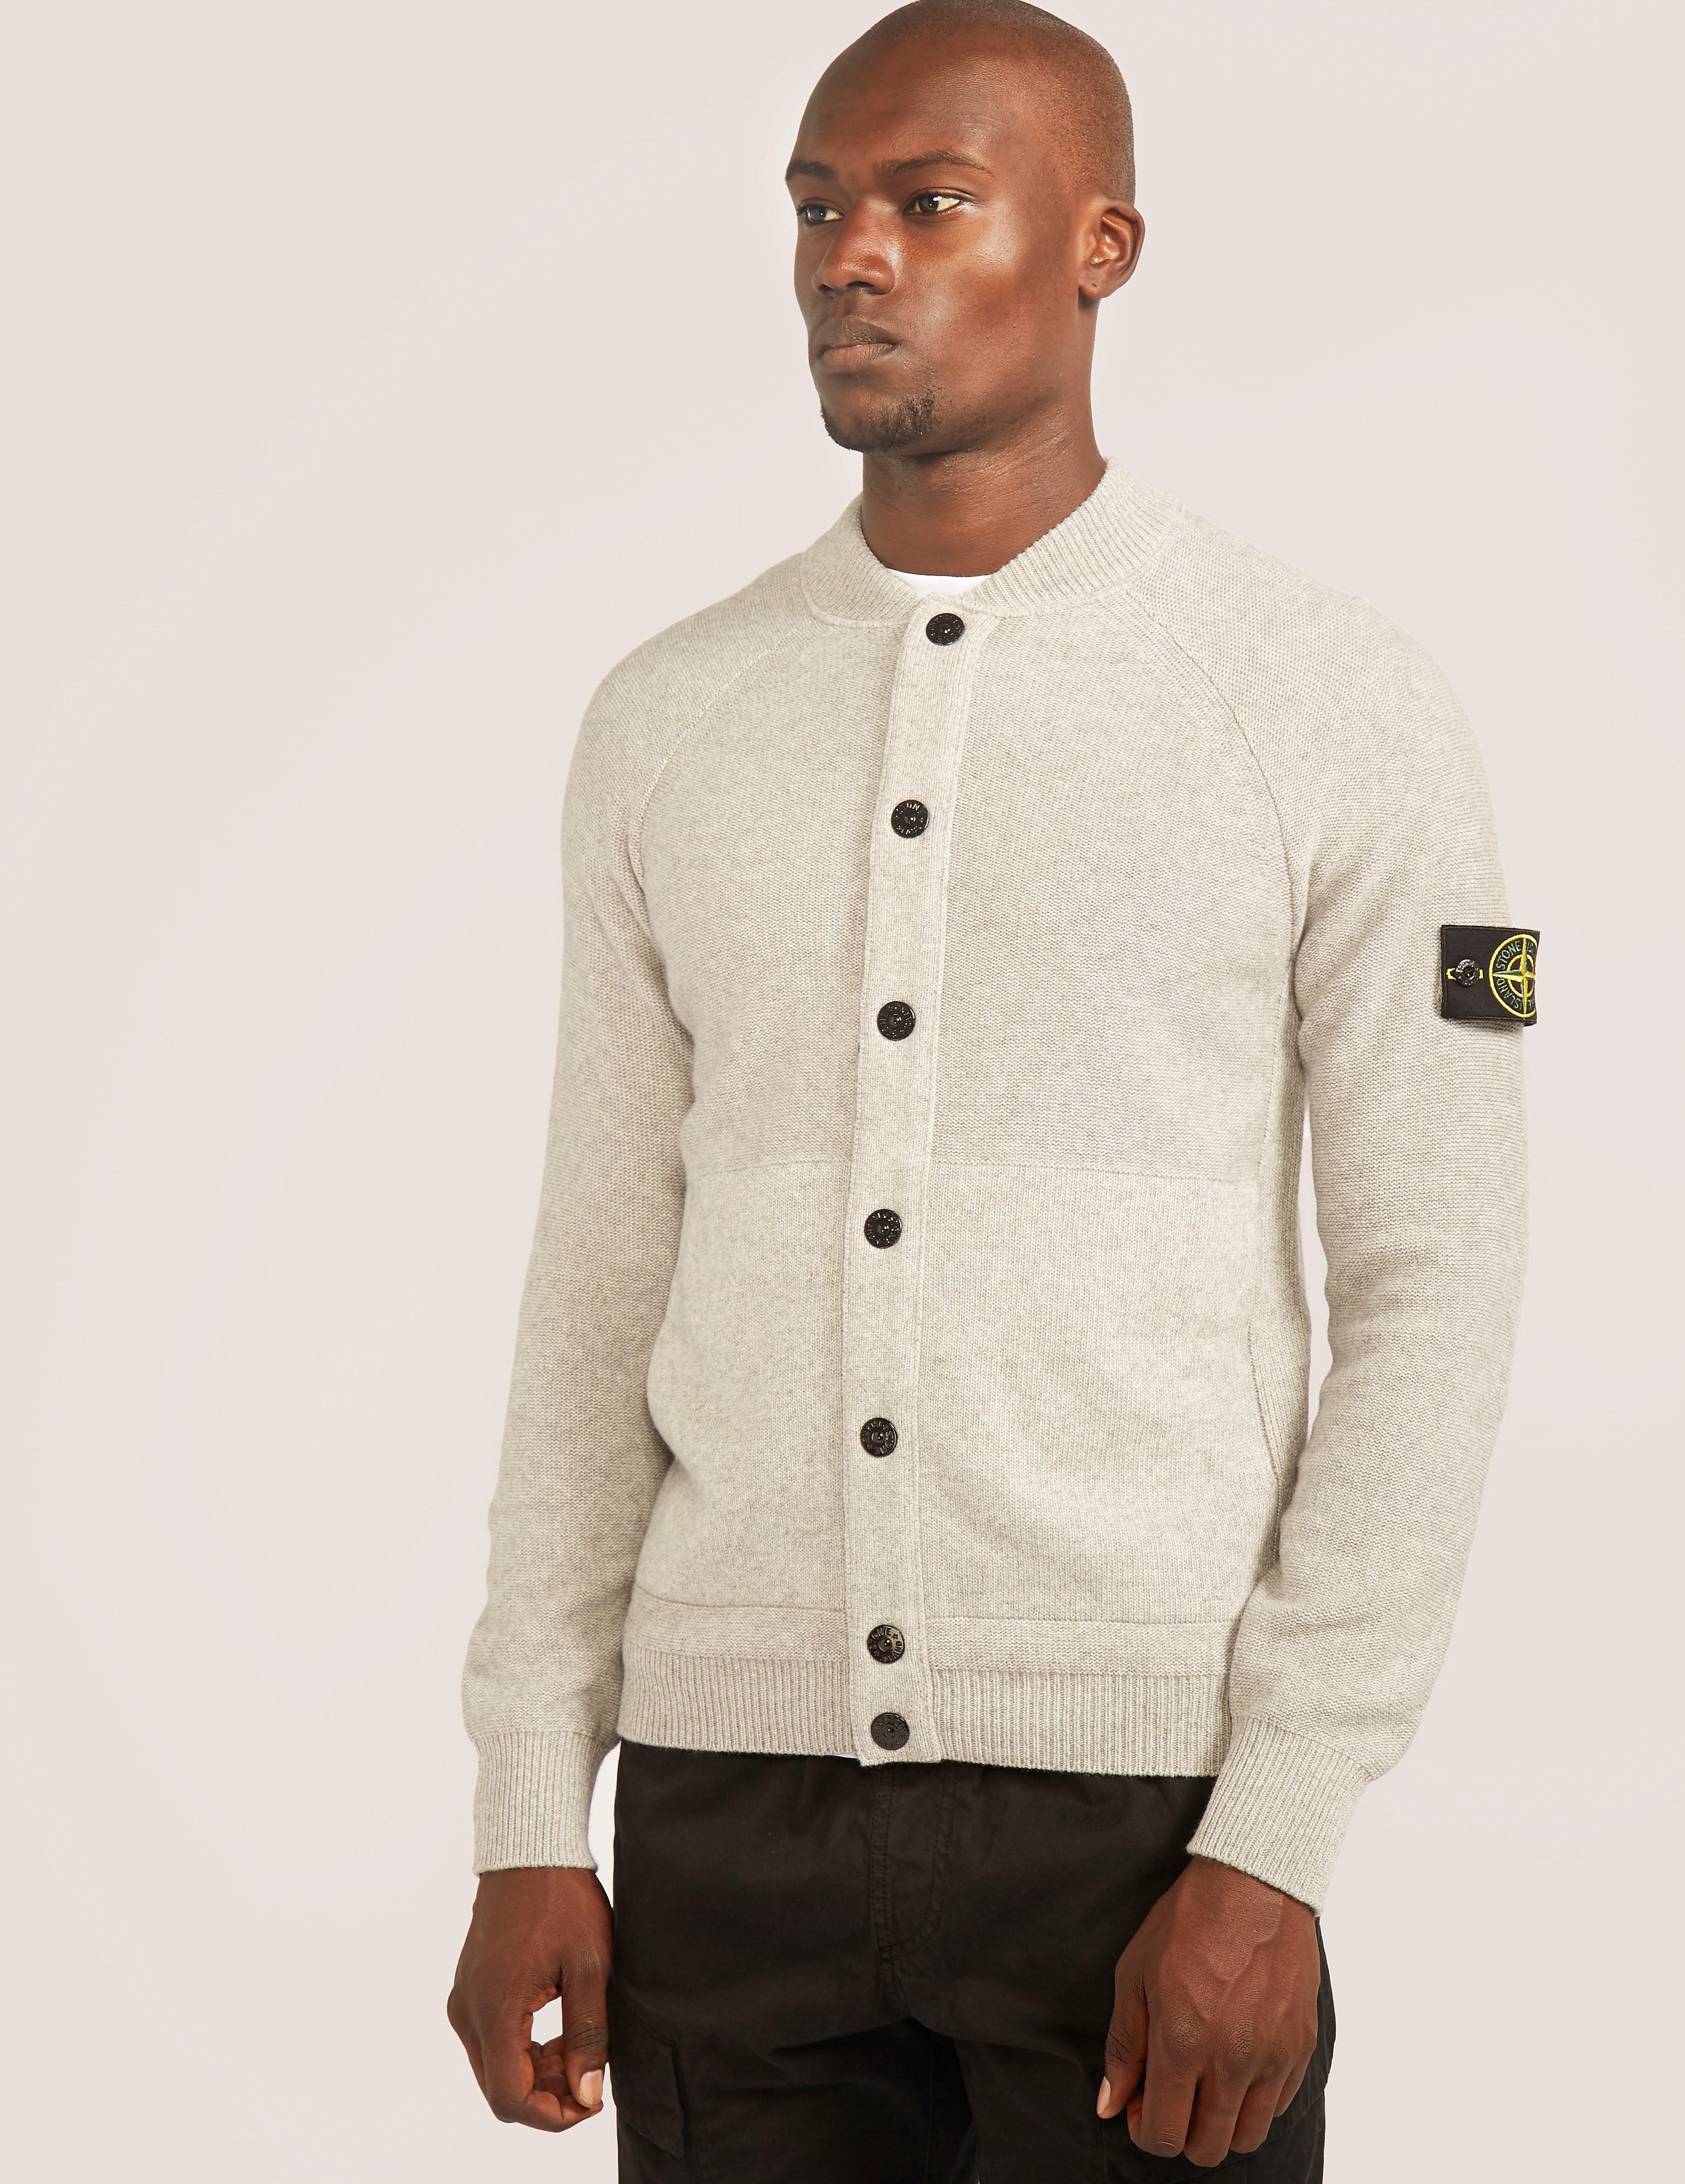 Stone Island Cashmere Button Knit